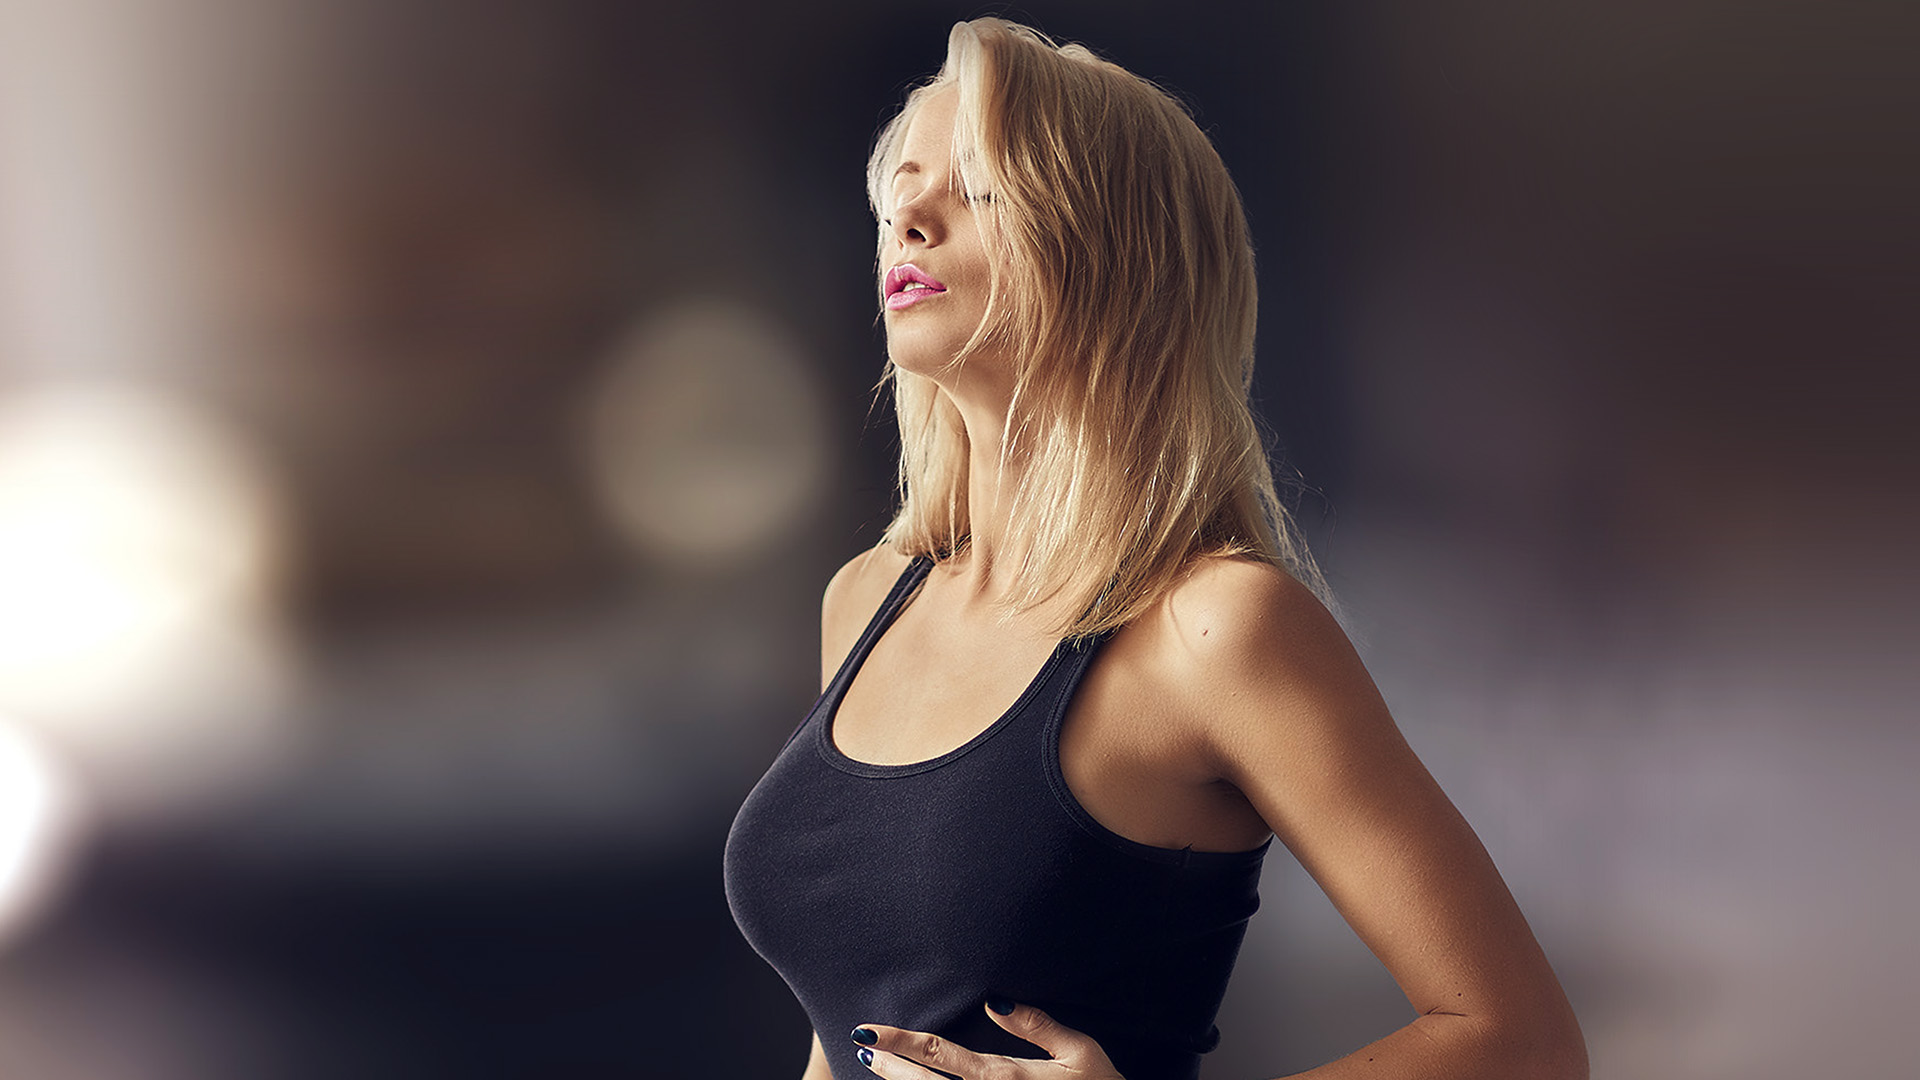 Ho60 Girl Sexy Woman Model Blonde Wallpaper